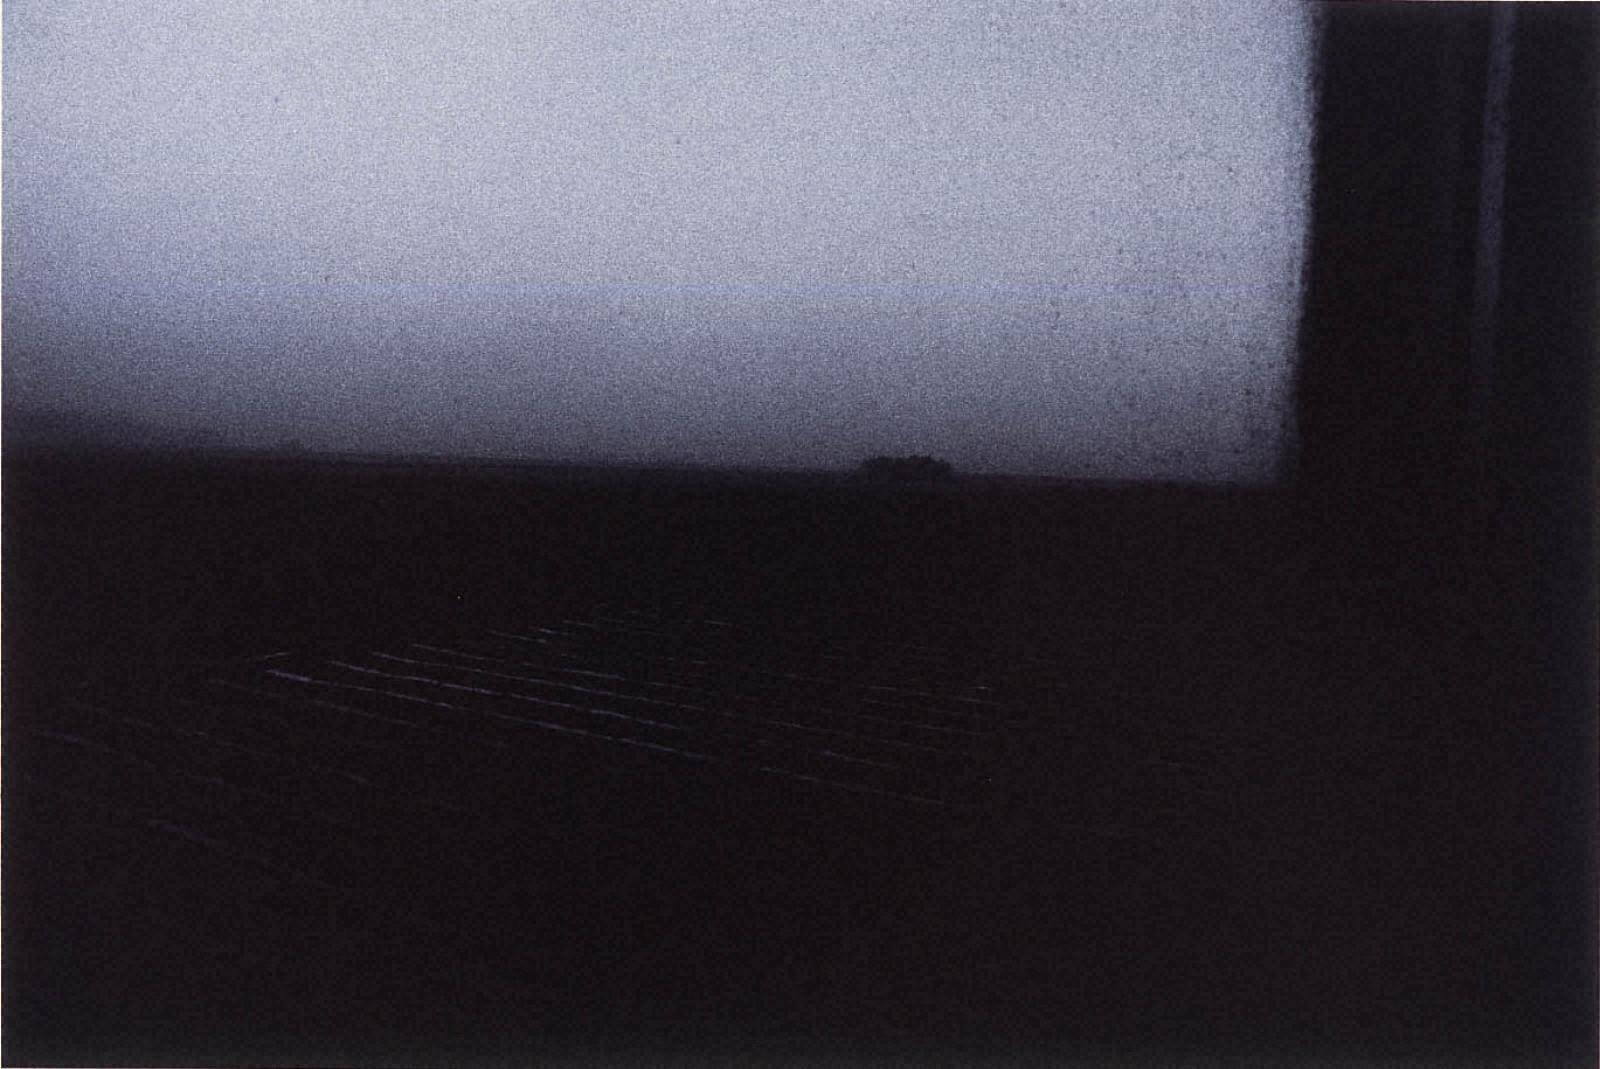 [Jun SHIRAOKA Photographs 1970-1998]愛媛県、土居(伊予土居)、1971年3月27日